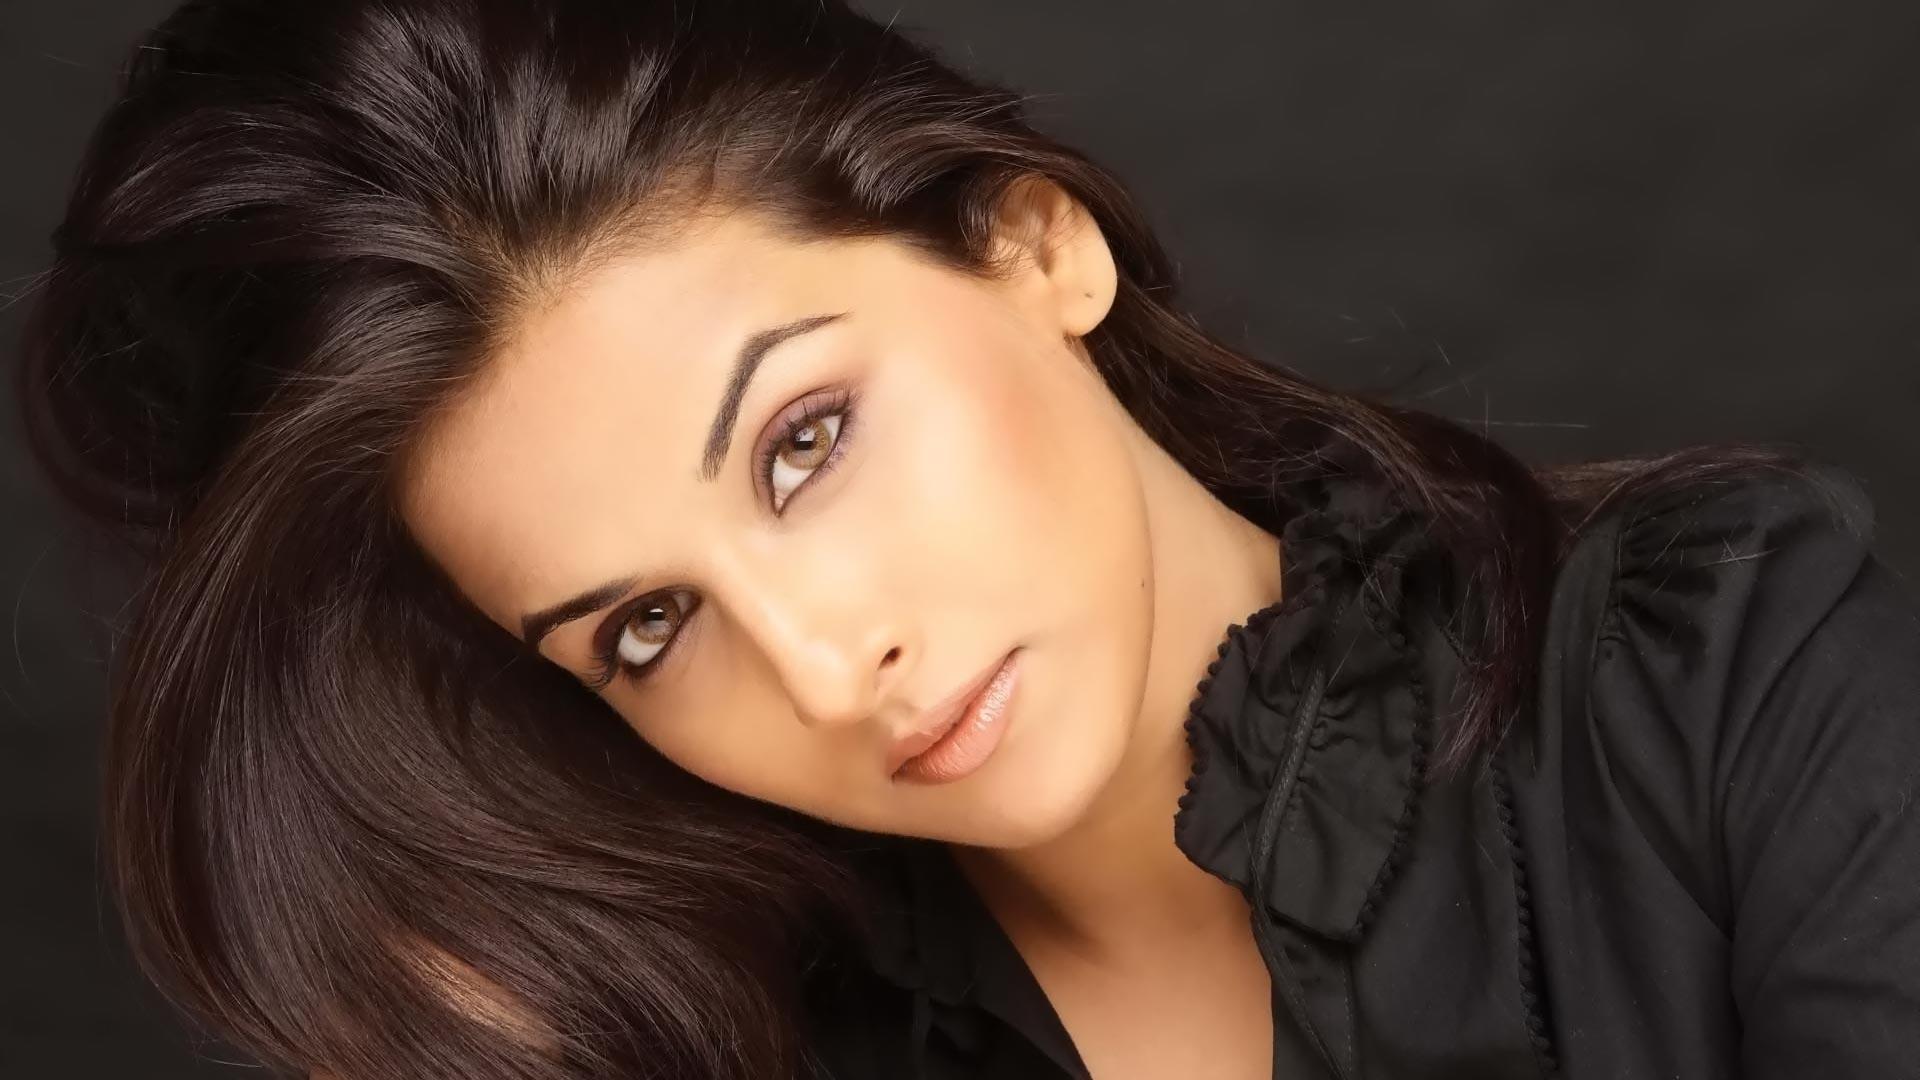 Top 10 Highest Paid Actress